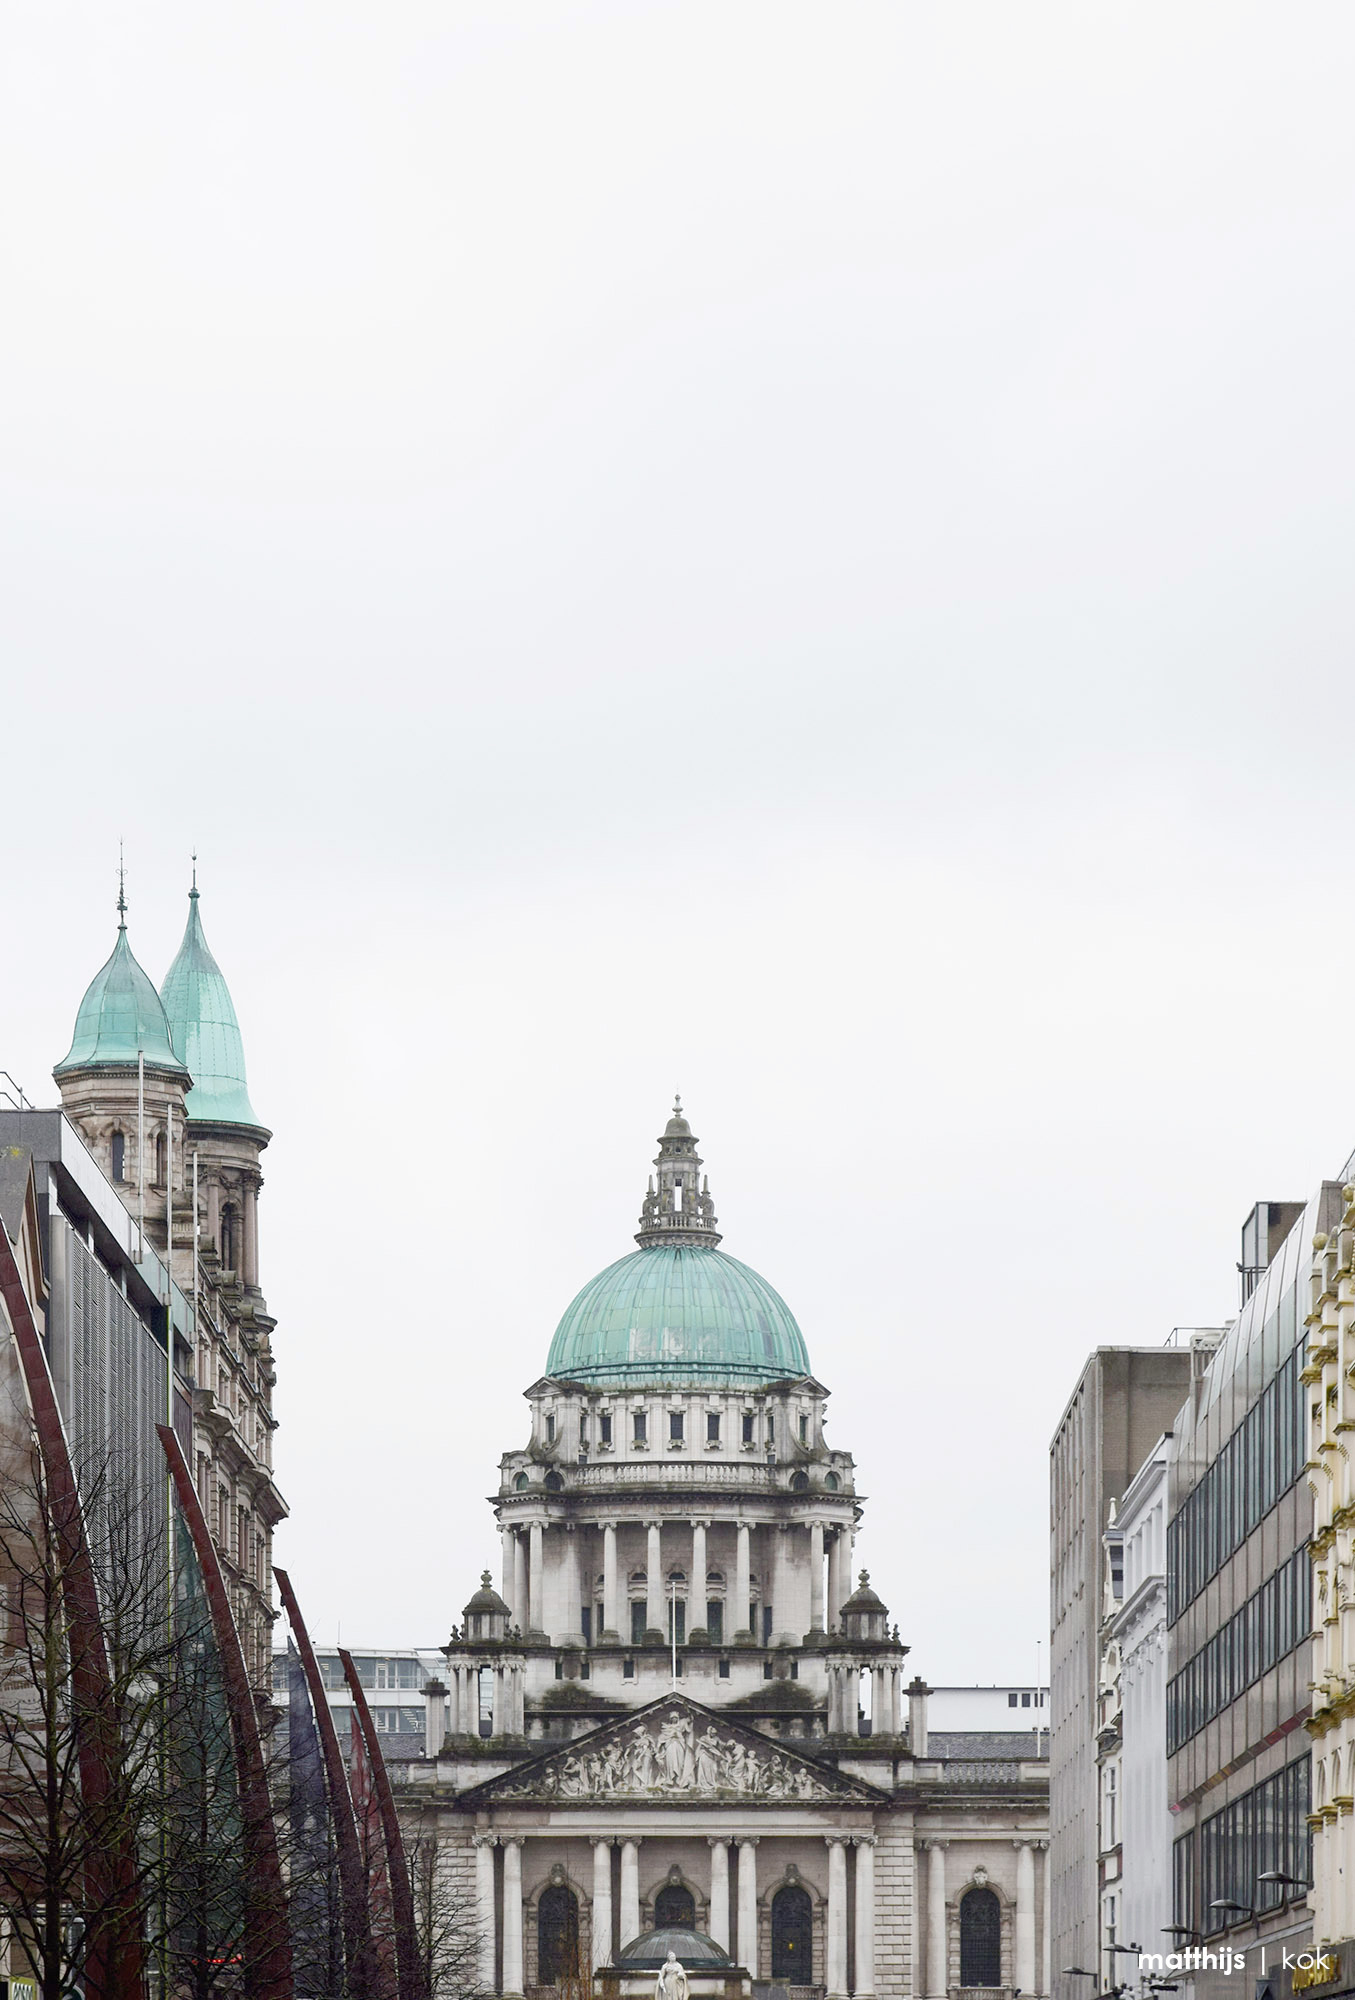 Belfast City Hall, Northern Ireland | Photo by Matthijs Kok